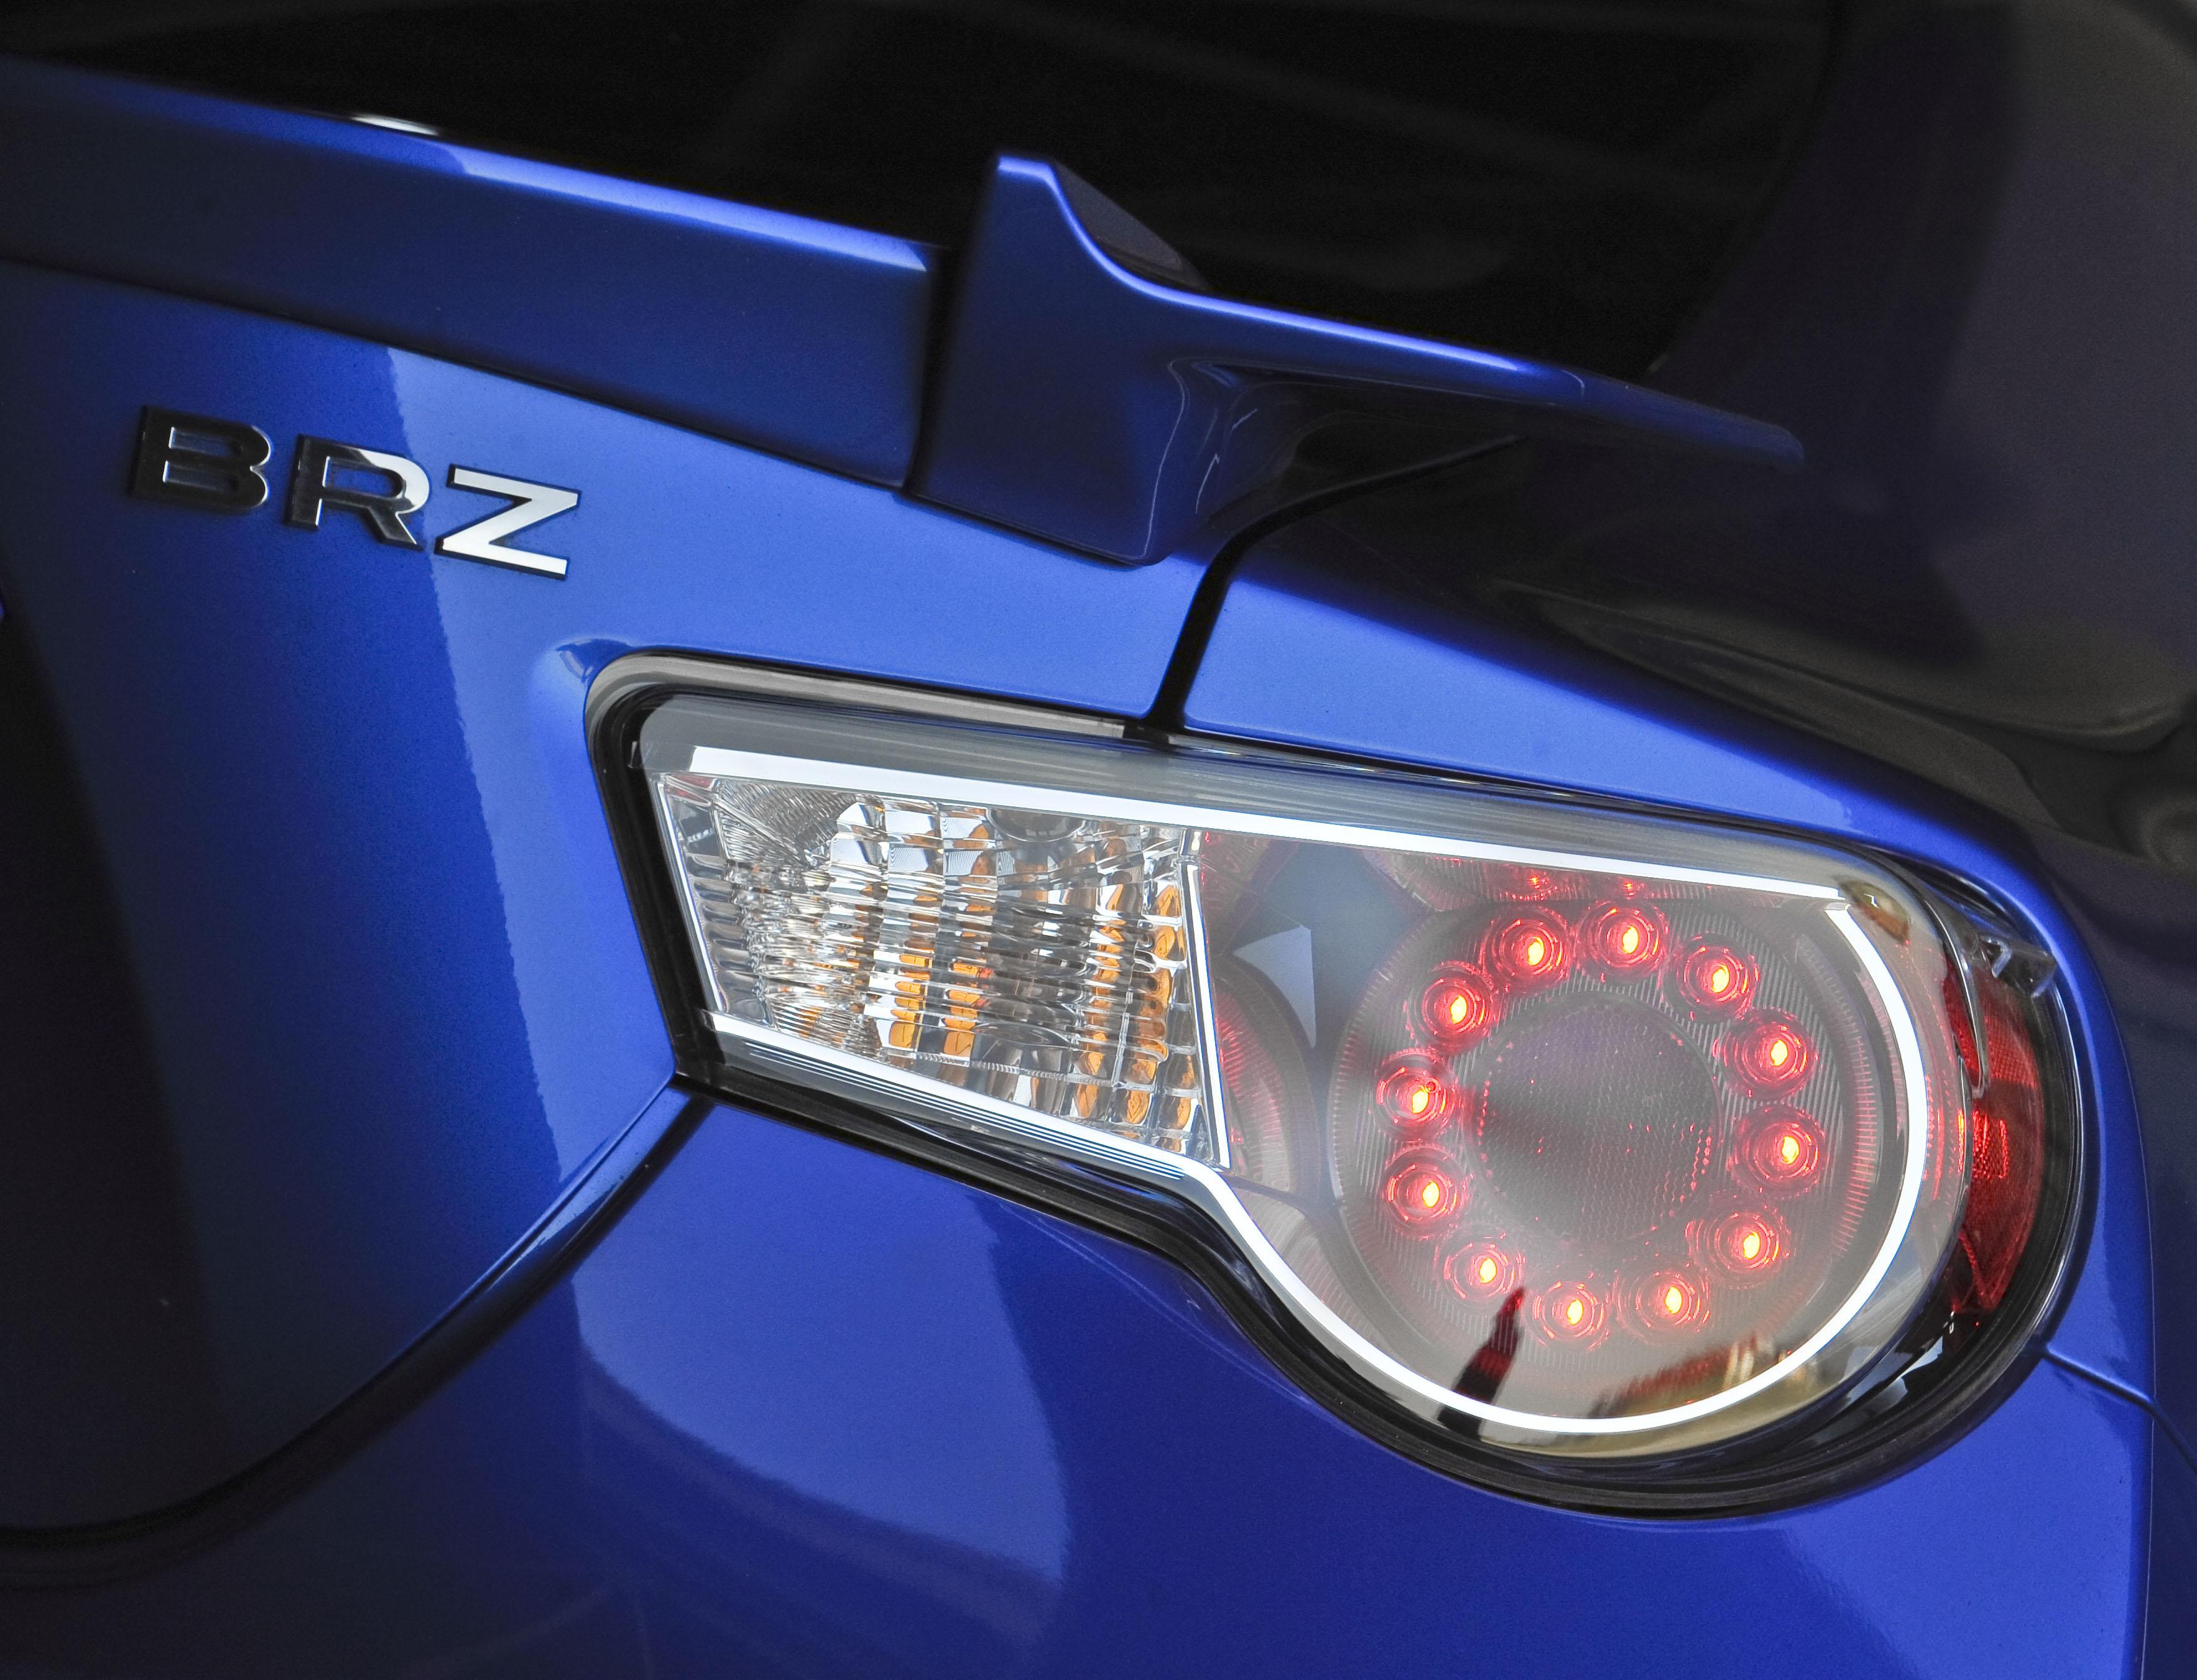 Wallpaper Sports Car Subaru 2015 Netcarshow Netcar Car Images